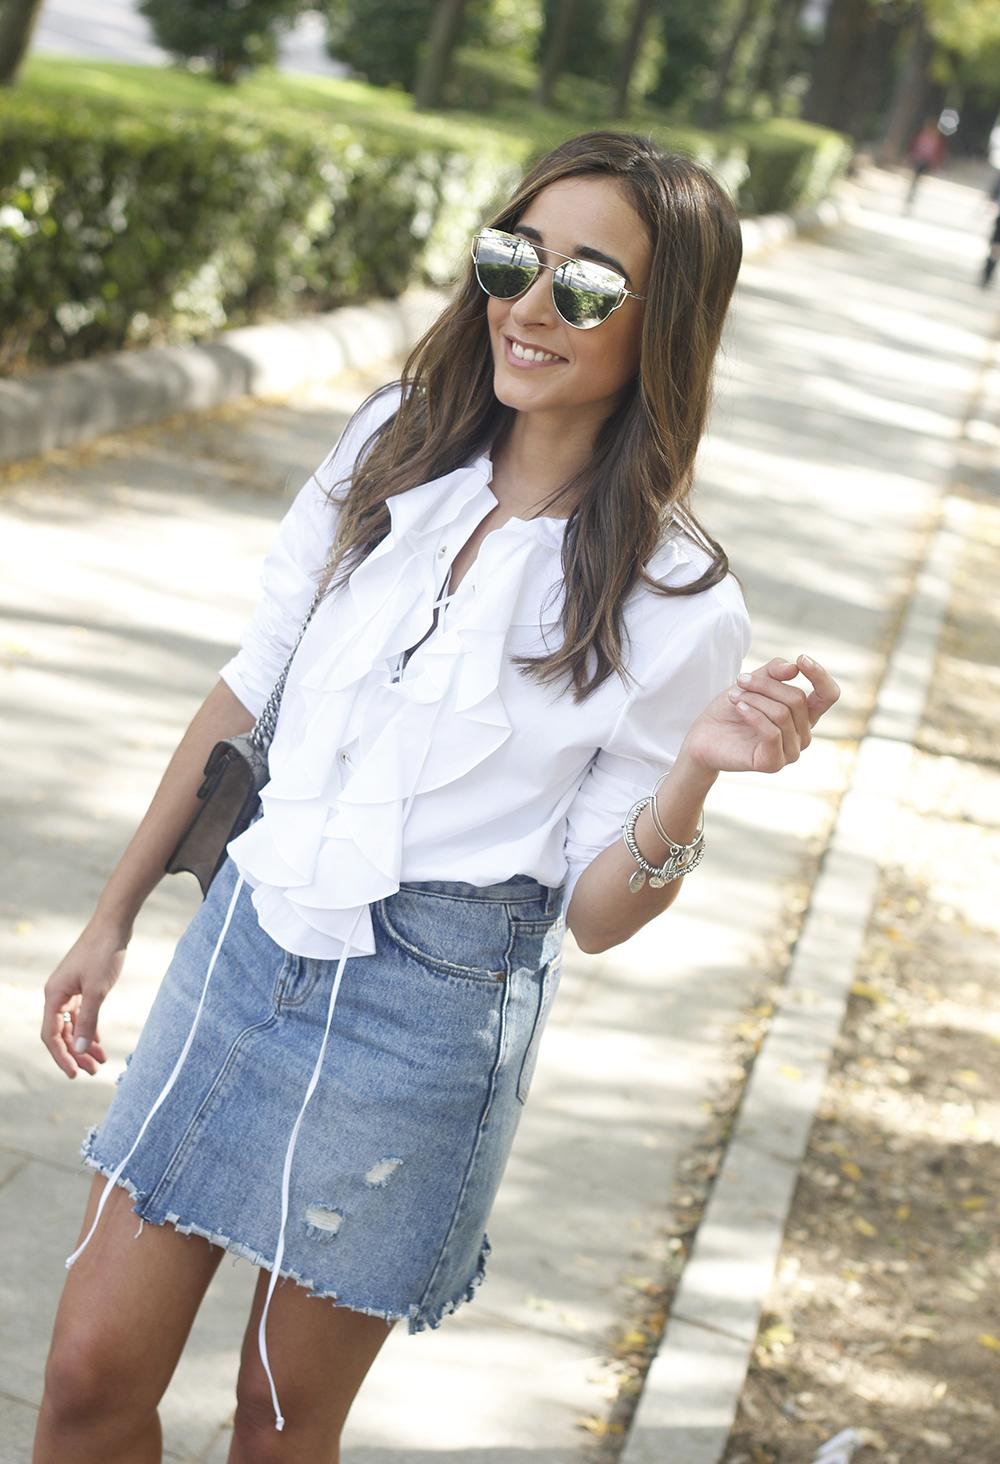 ruffled shirt uterqüe denim shirt sunnies heels gucci bag outfit fashion style17